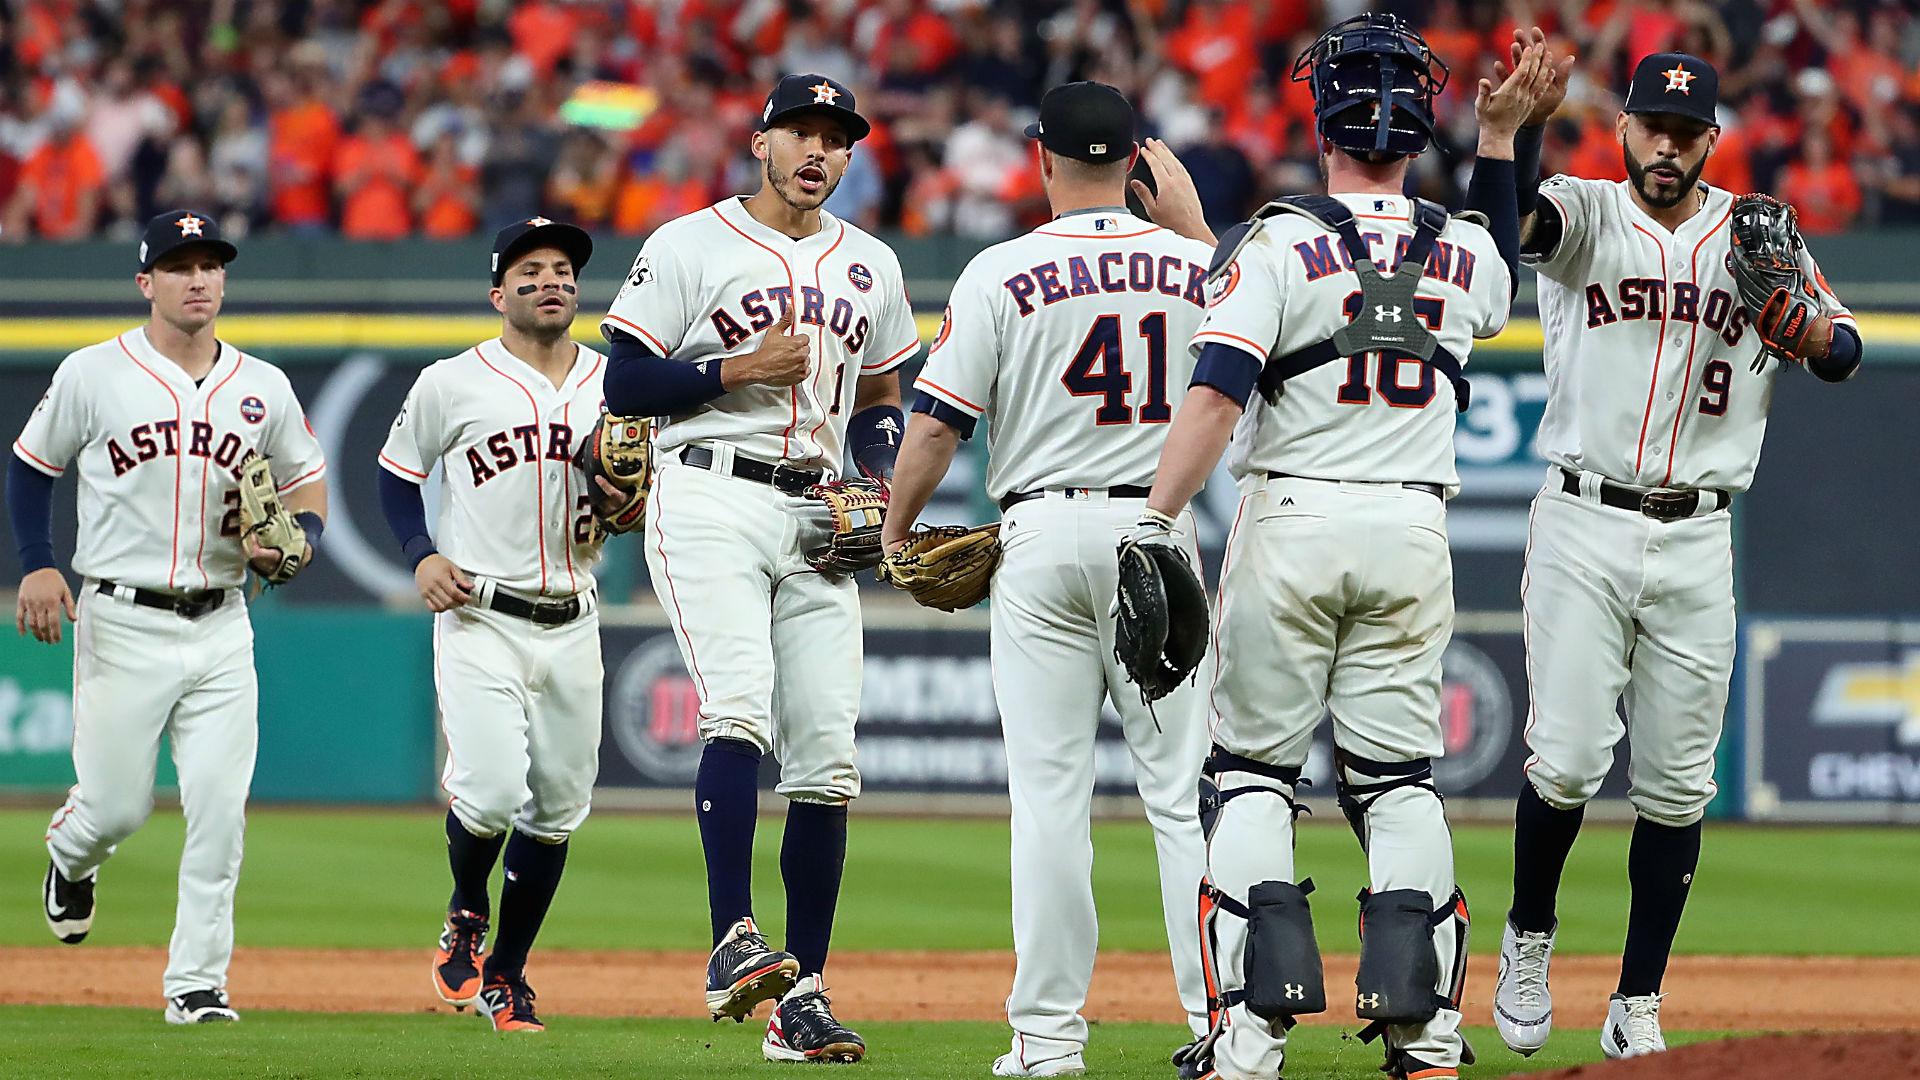 World Series 2017: Astros in unfamiliar territory in trek to abolish playoff heartbreak